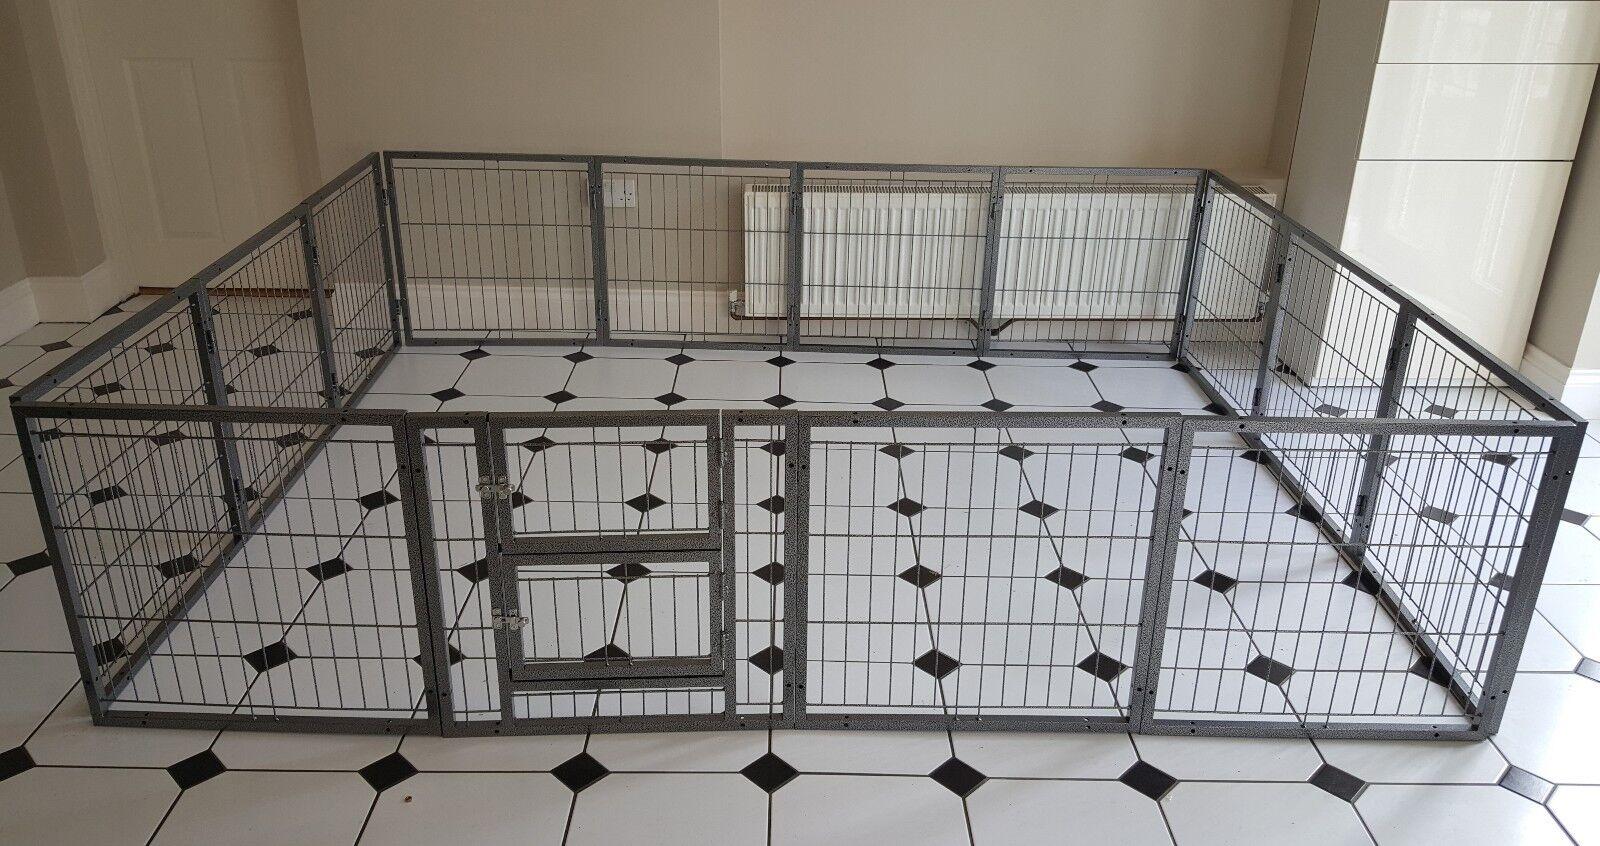 Margothedog cucciolo esercizio Penna MODULARE cane gabbia gabbia gabbia CUCCIOLI Penna del sistema 8c8afc